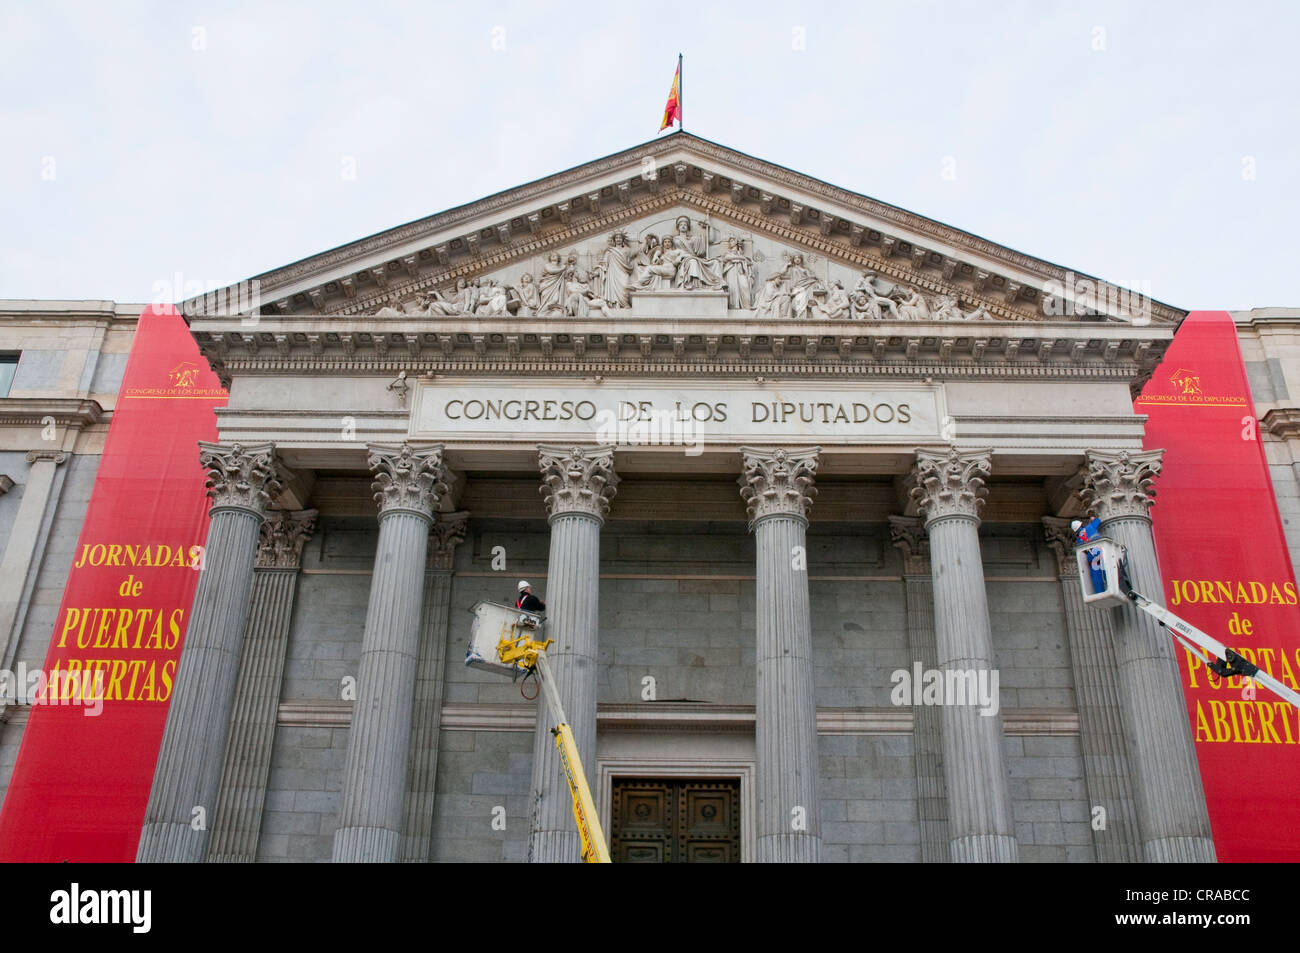 Preparing the Open Doors Days, Congreso de los Diputados. Madrid, Spain. - Stock Image